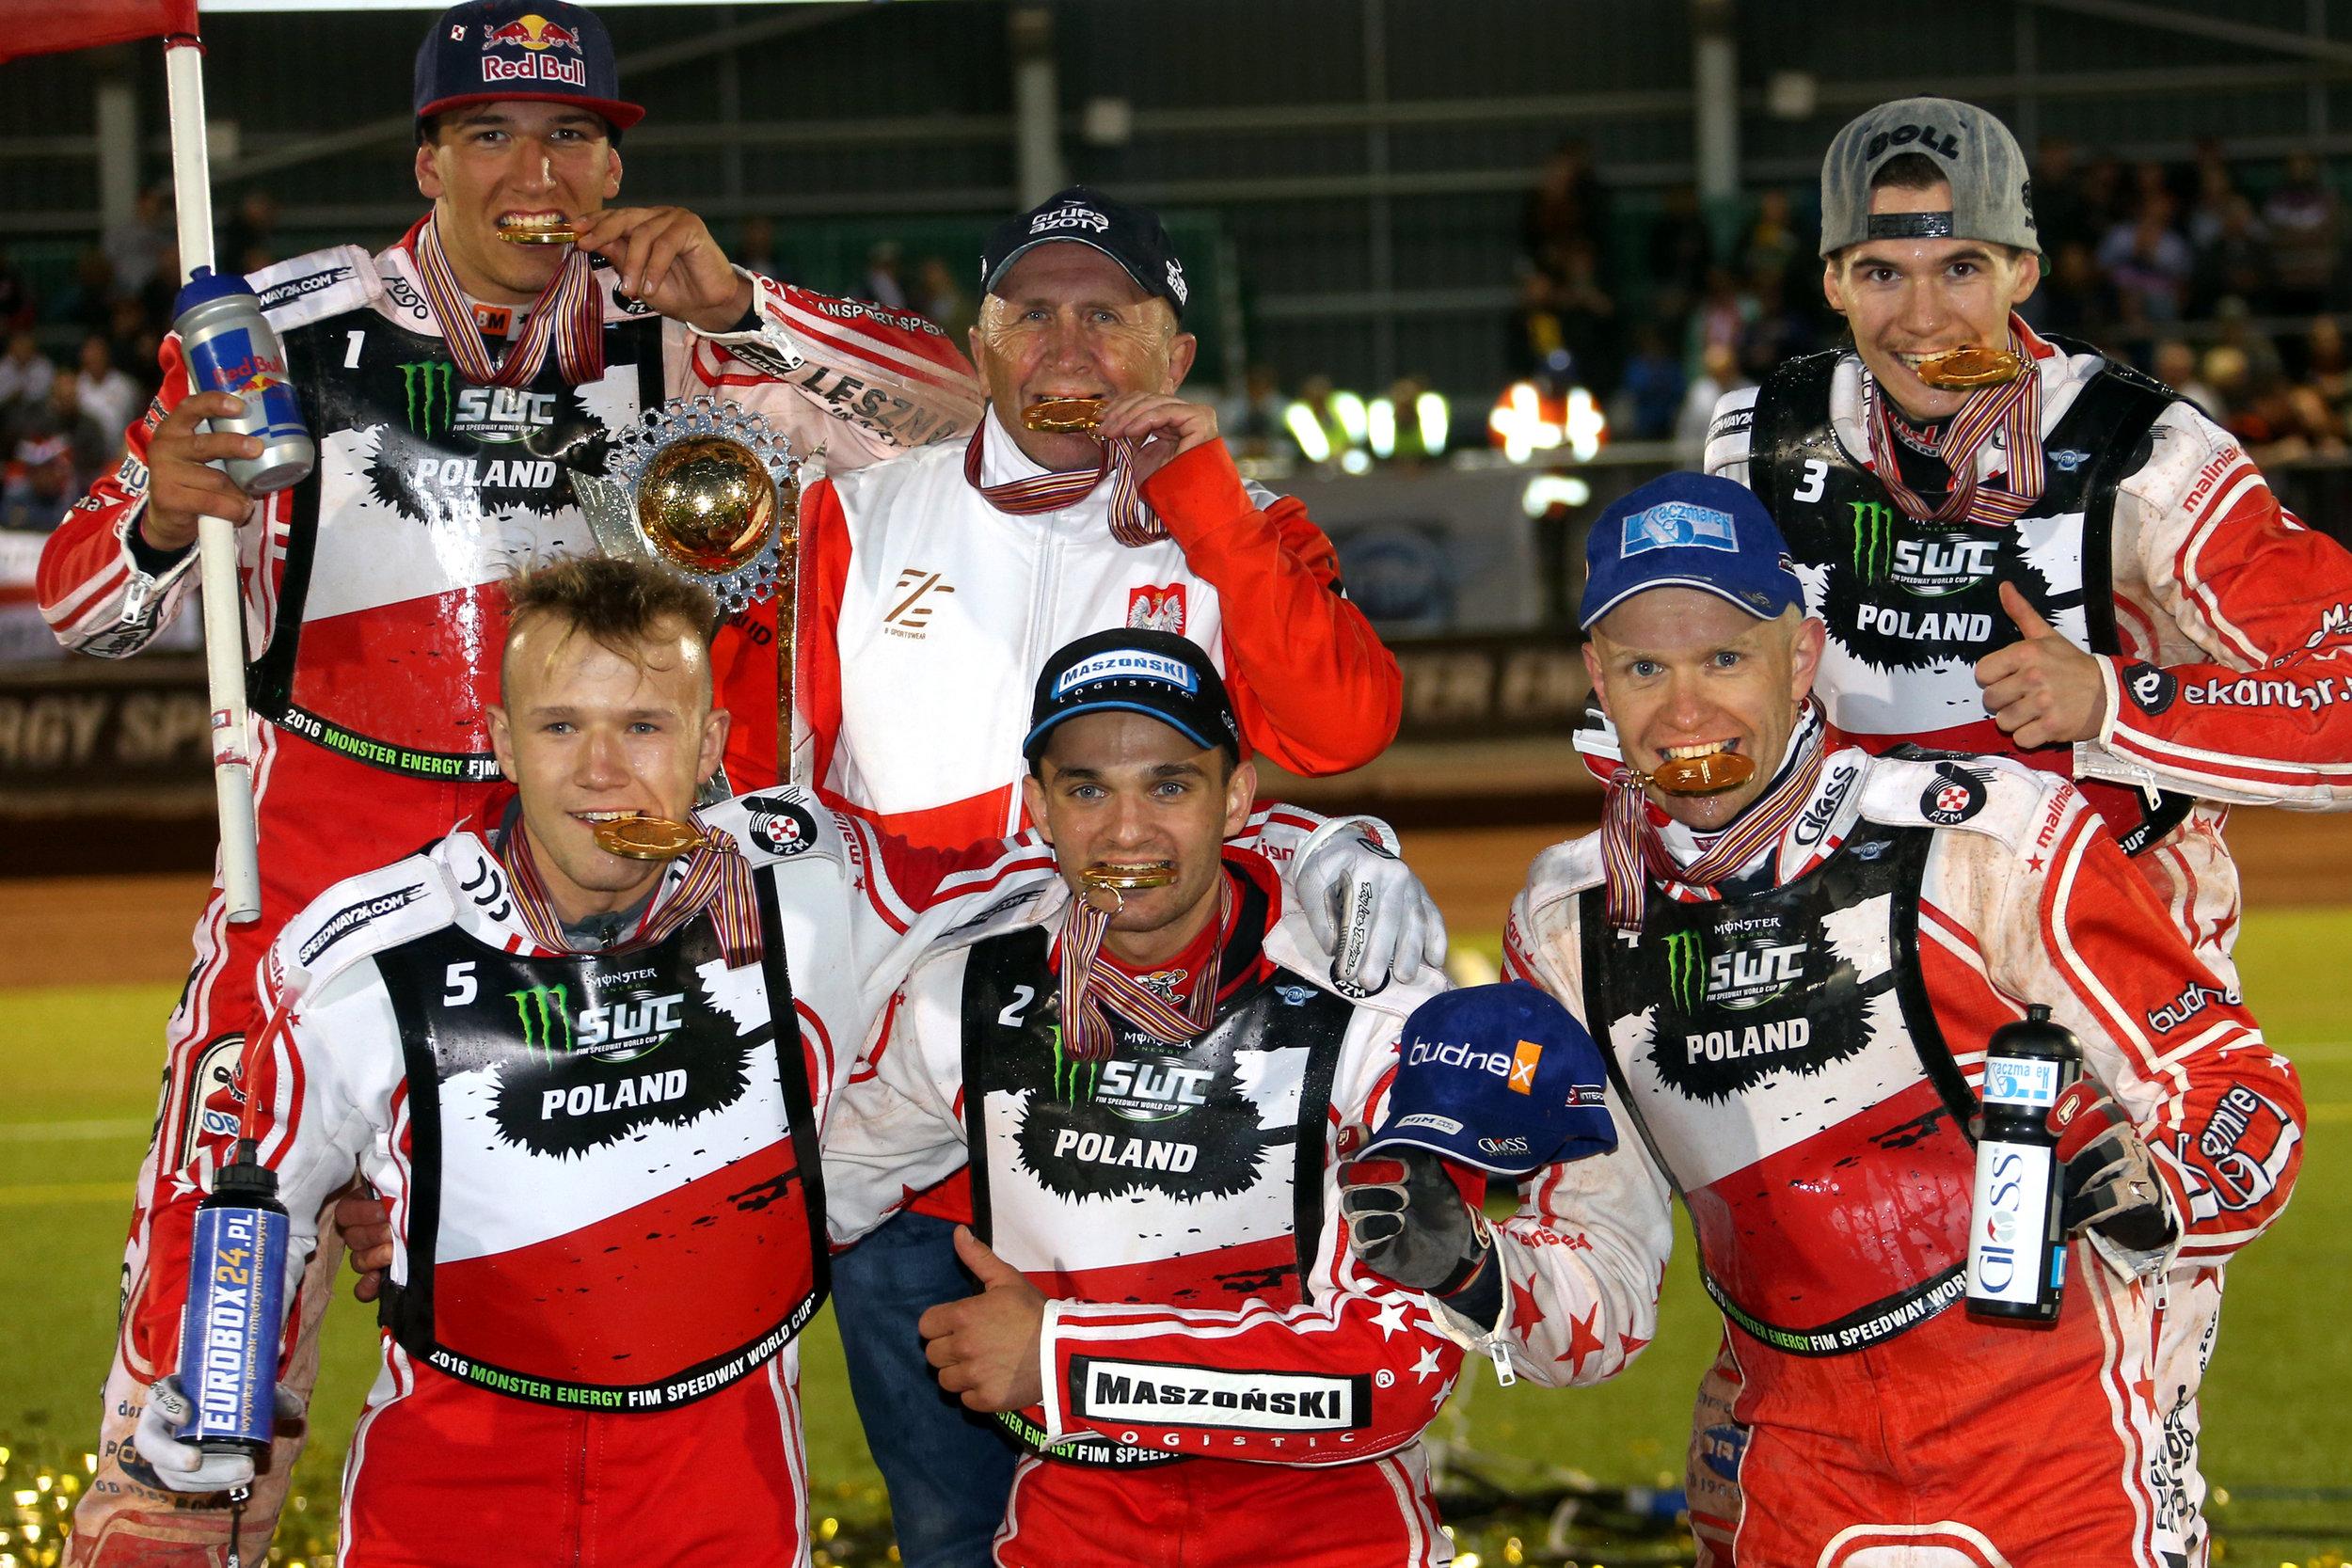 polska5396(c)SpeedwayGP.jpg